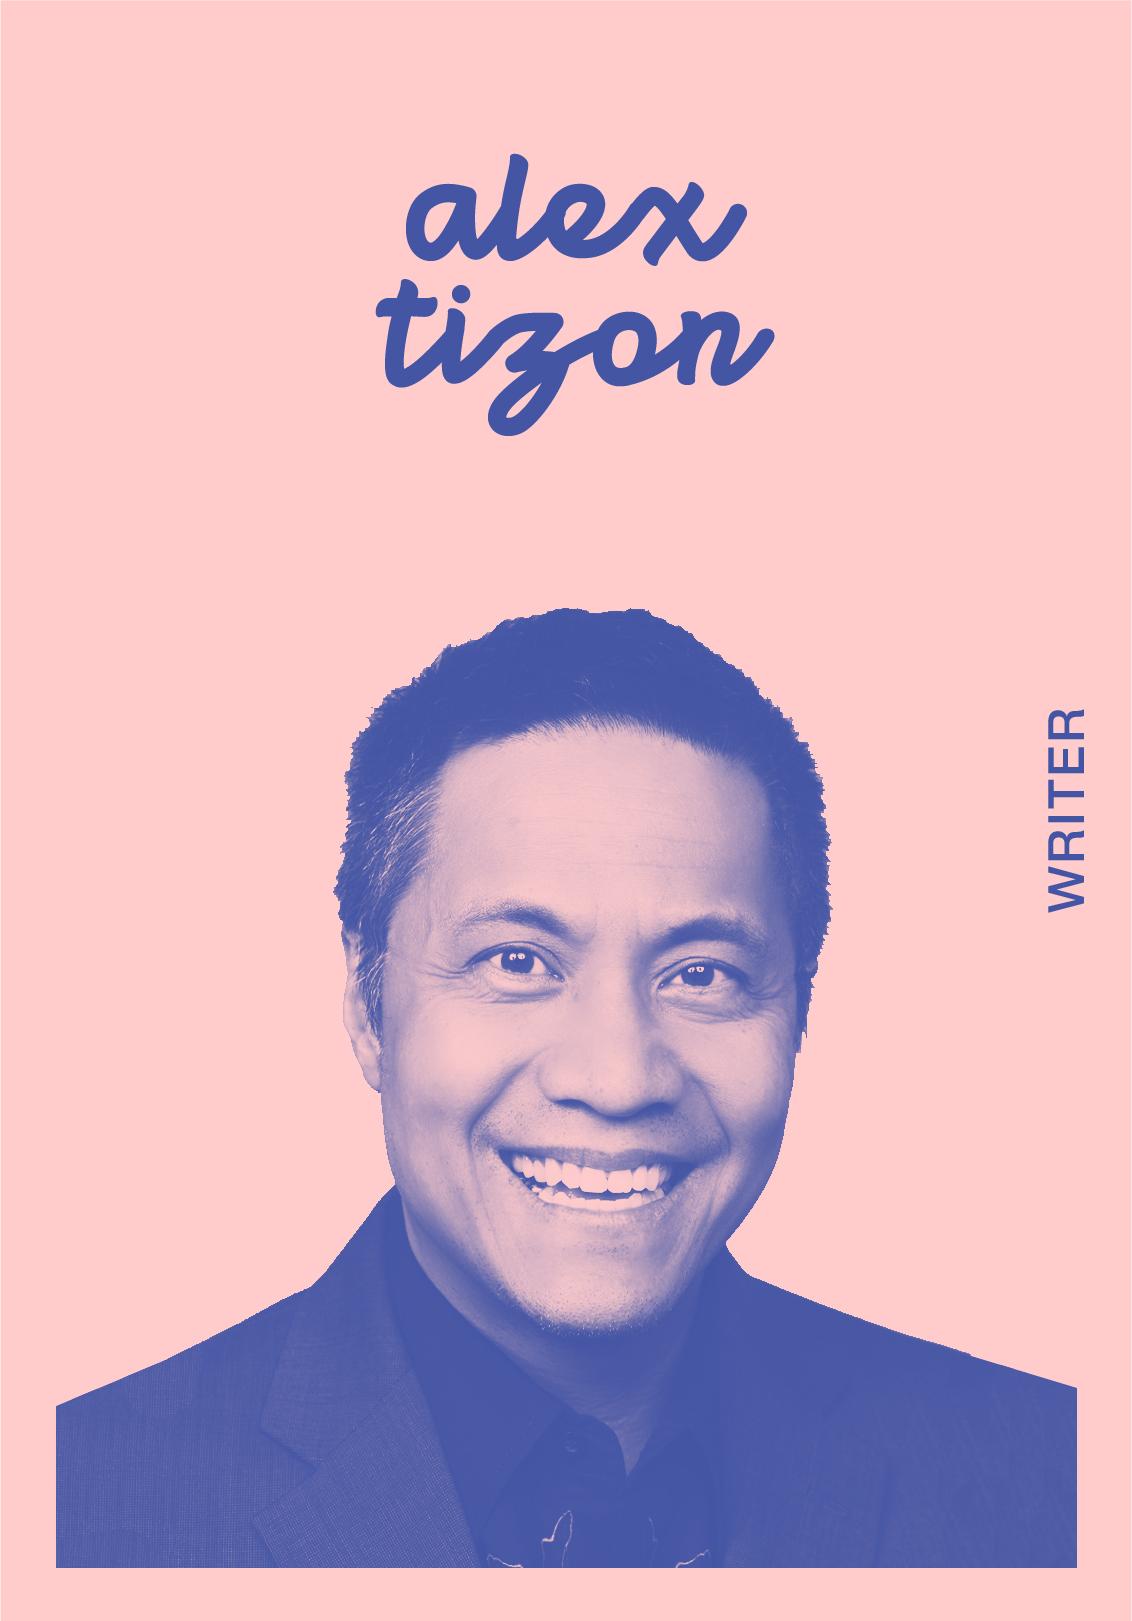 ALEX TIZON   WEBSITE   @ALEXTIZON   IG: ALEXTIZON